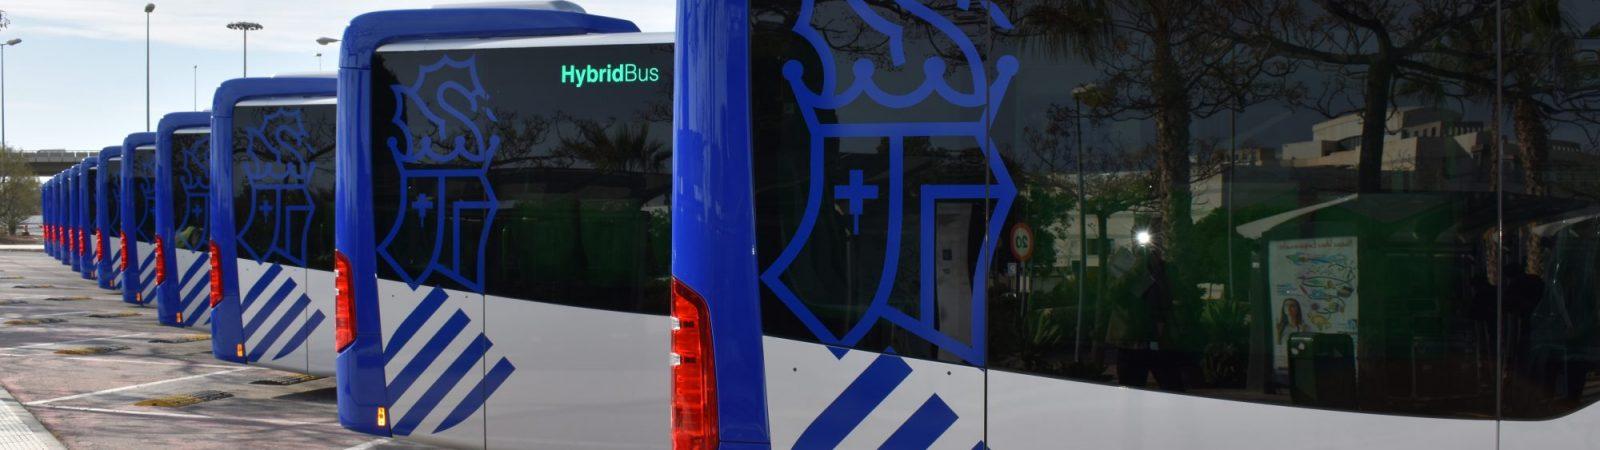 Autobuses hídridos eléctricos